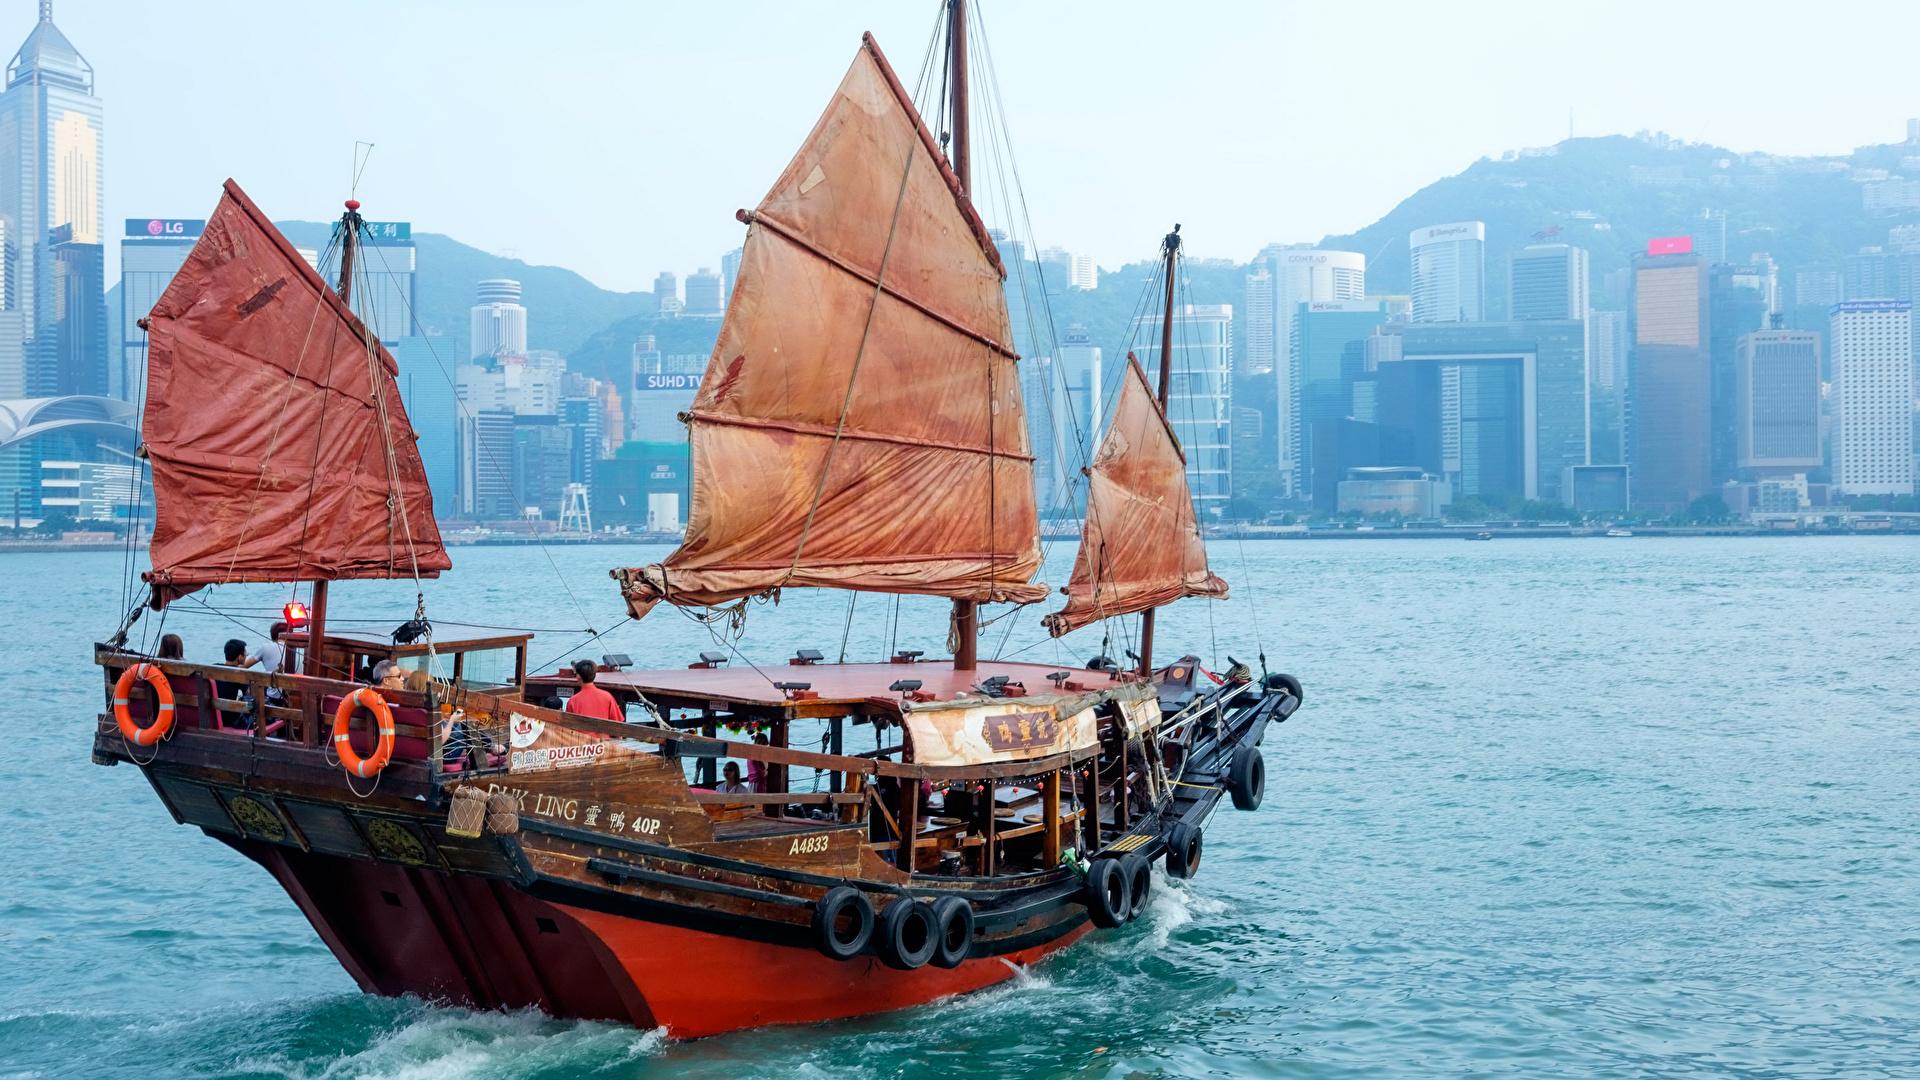 Fonds D Ecran 1920x1080 Hong Kong Mer A Voile Chine Bateau Fluvial Villes Telecharger Photo